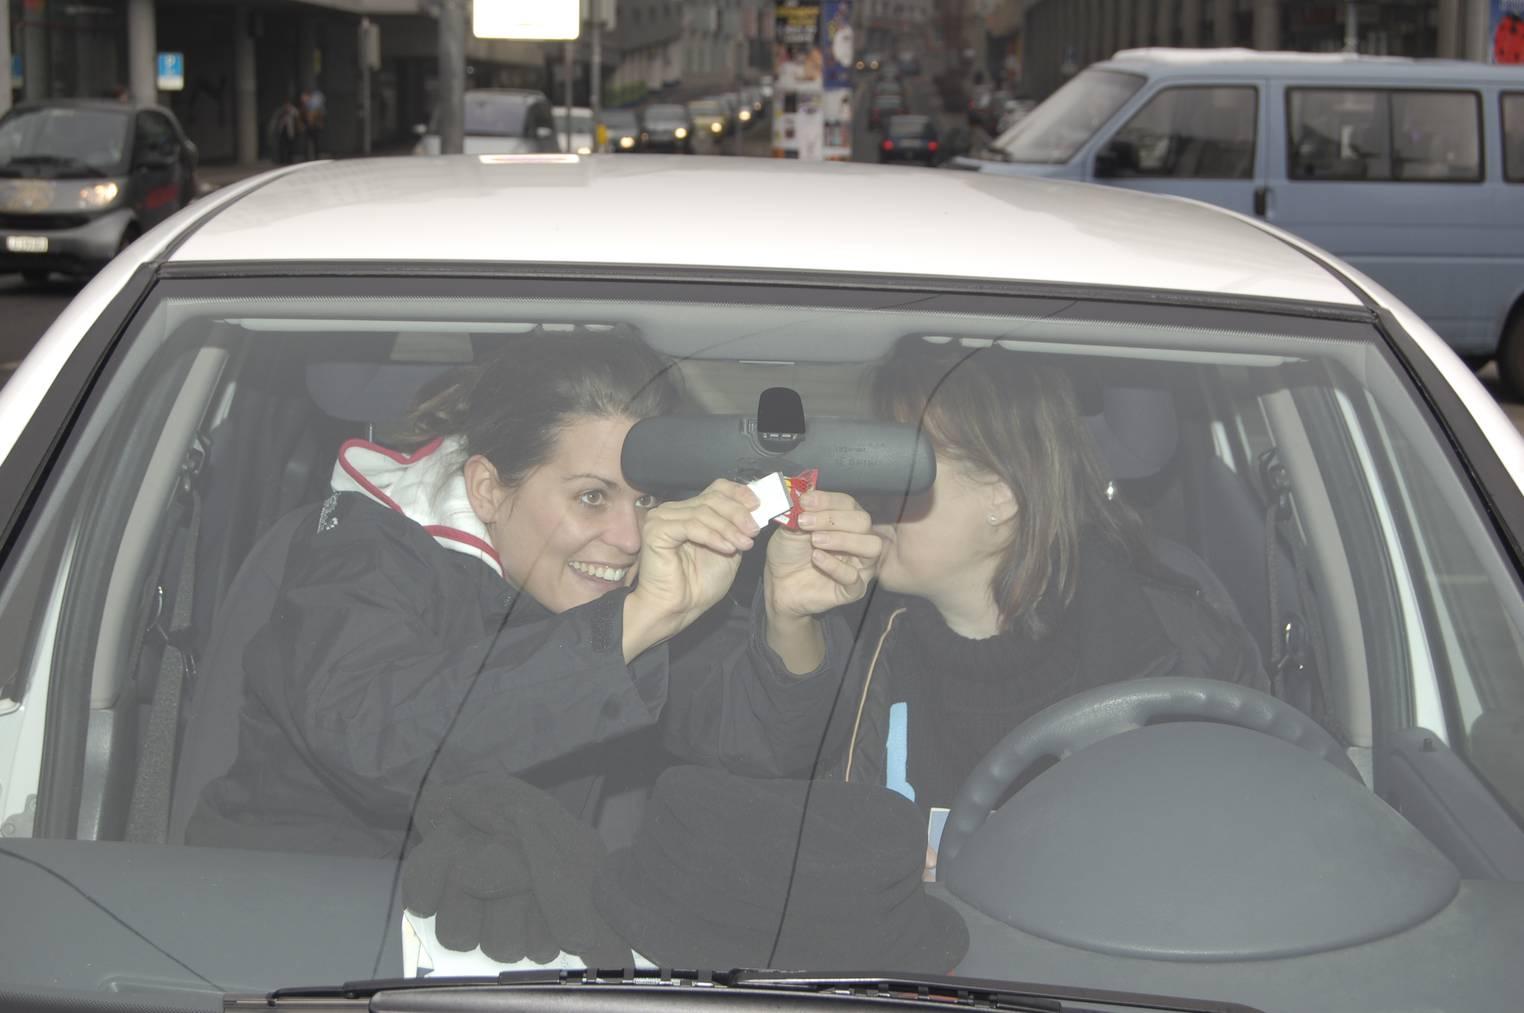 Radio Pilatus-Moderatorin Selina Linder (links) ersetzt bei einer Radio Pilatus-Hörerin die Autobahnvignette.